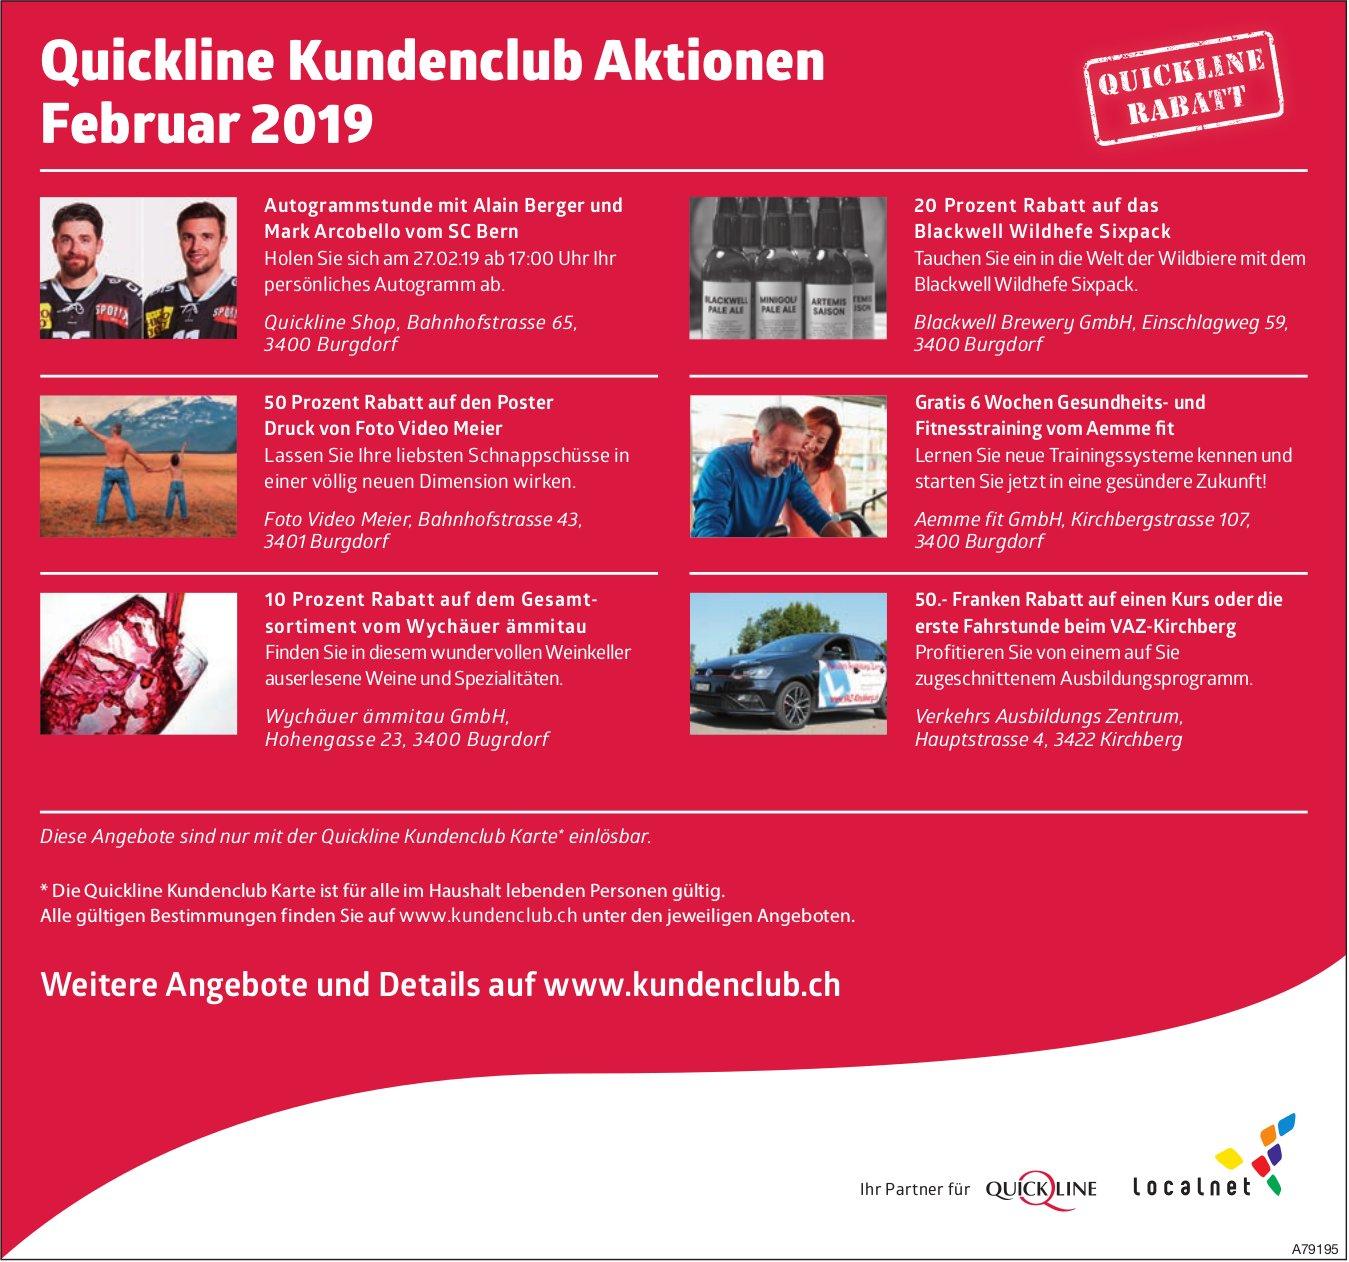 Quickline Kundenclub Aktionen Februar 2019